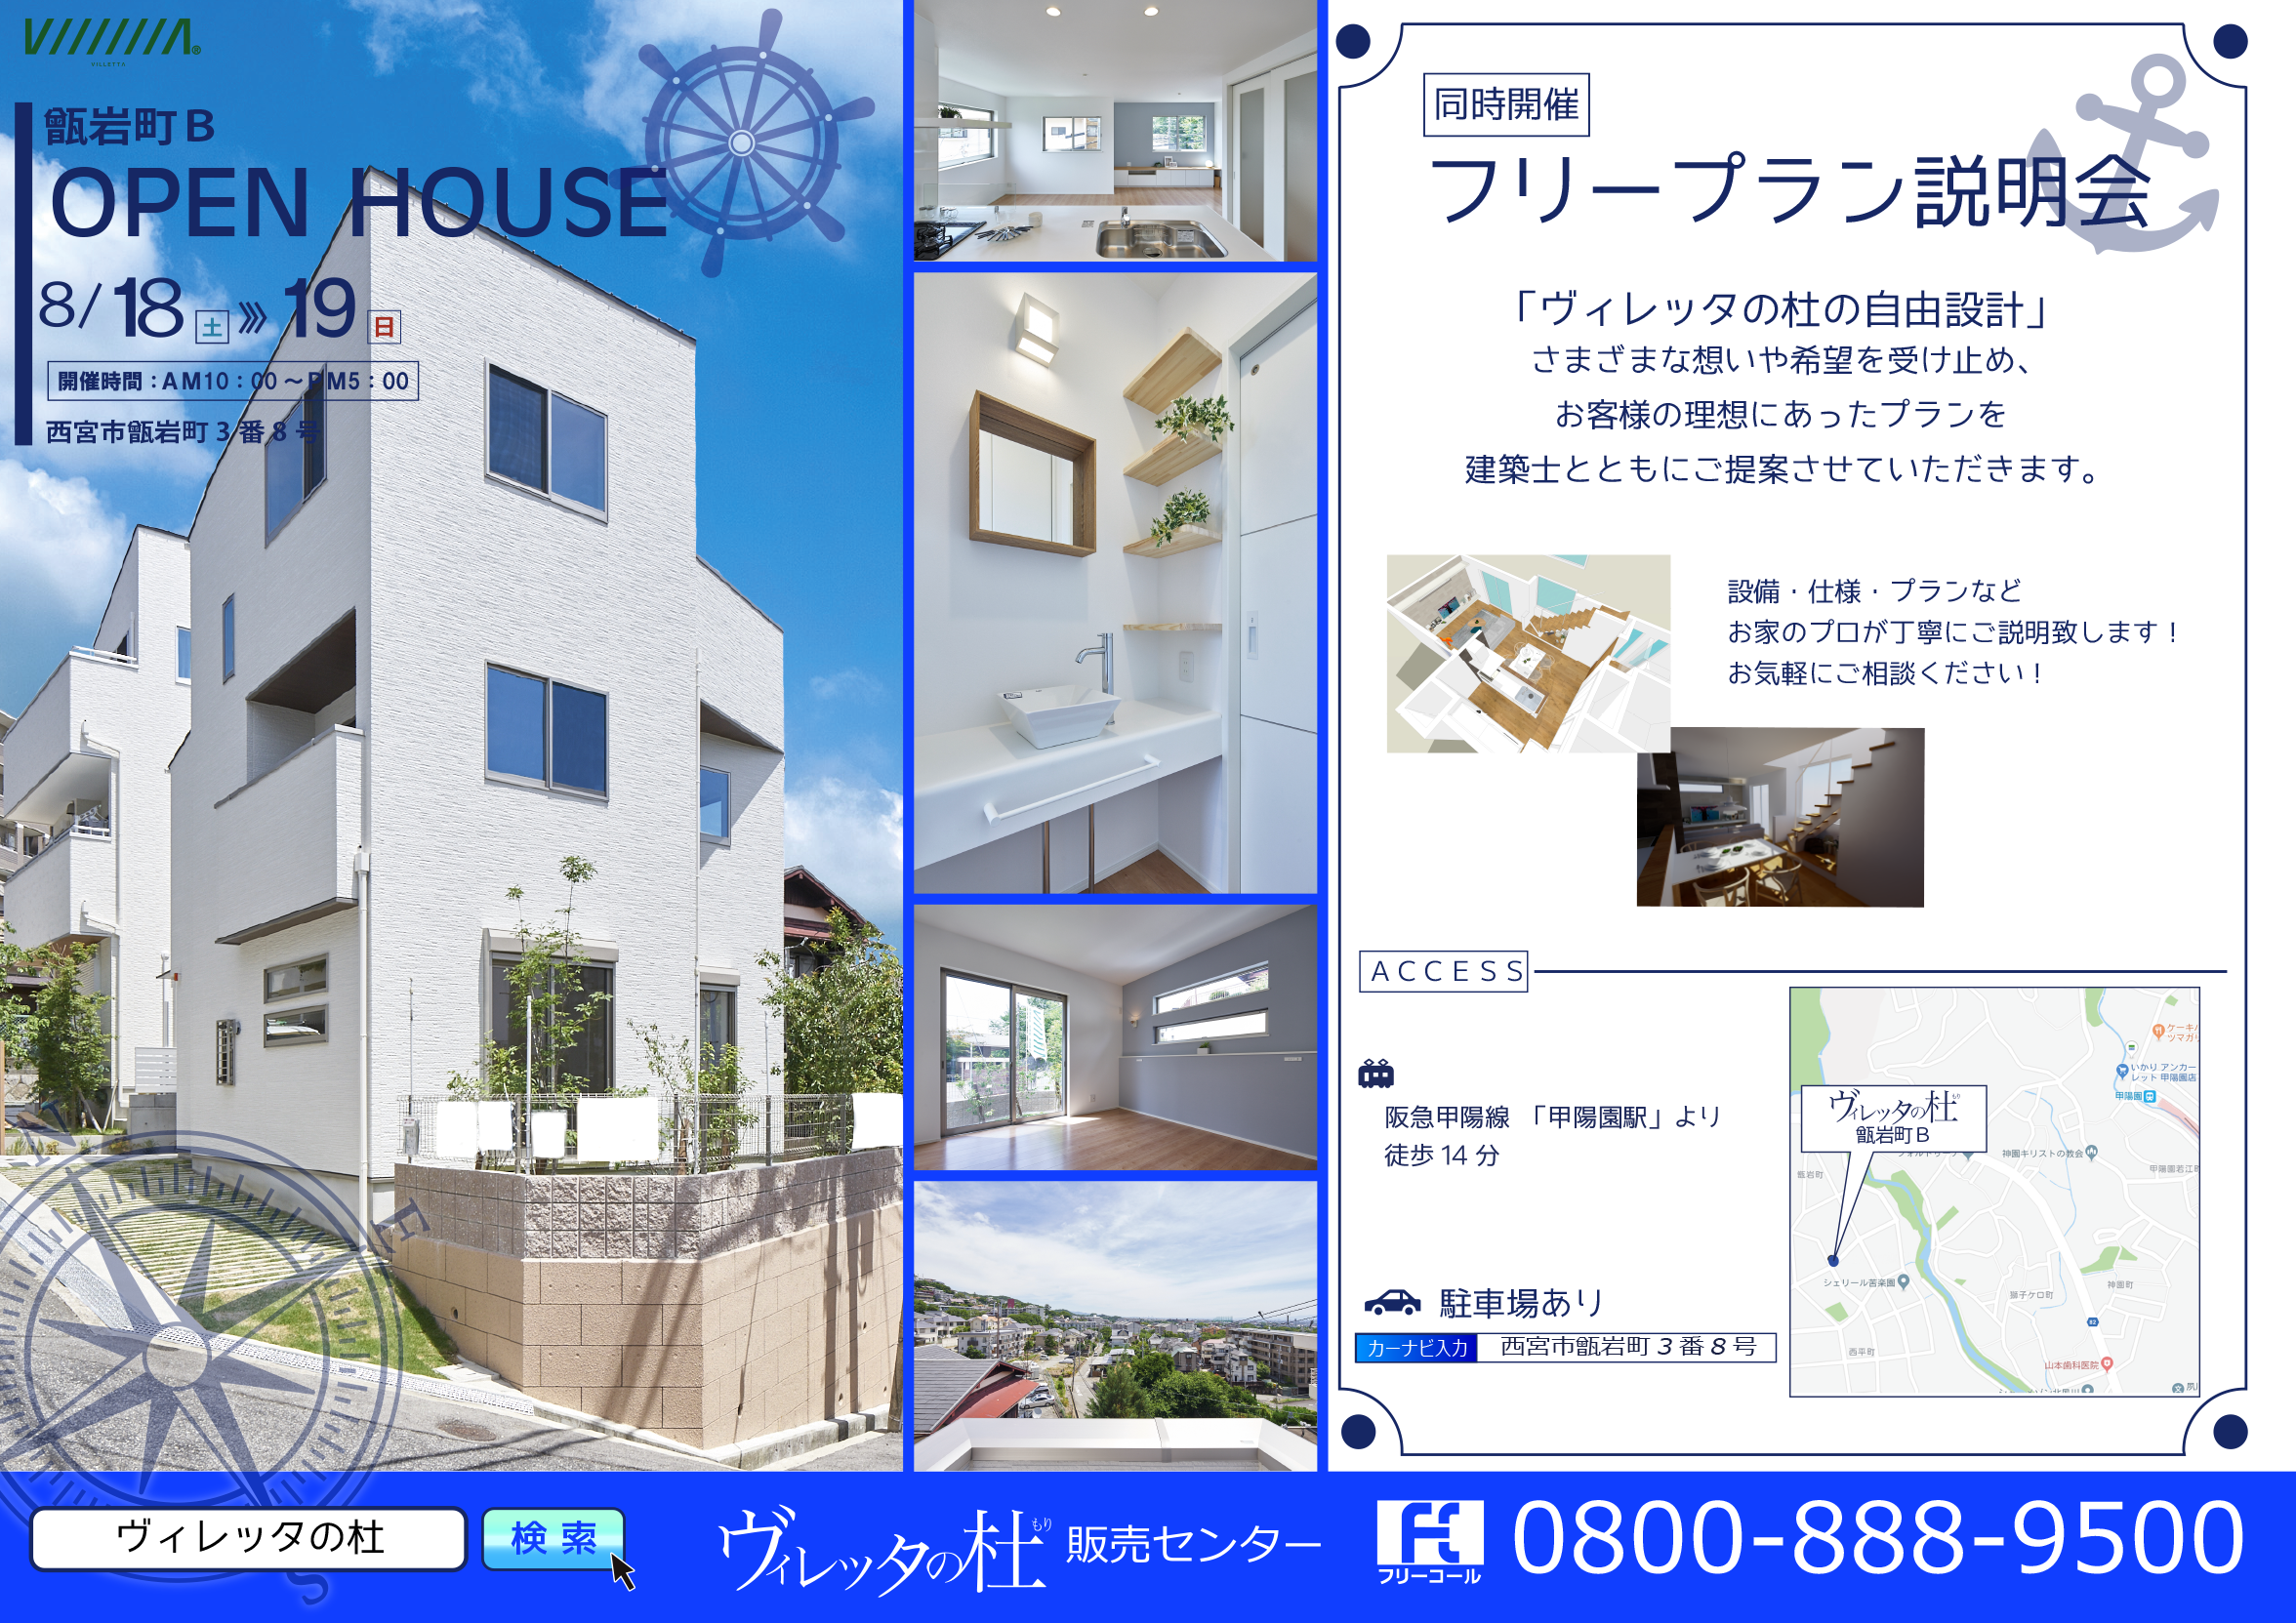 OPEN HOUSE甑岩町B